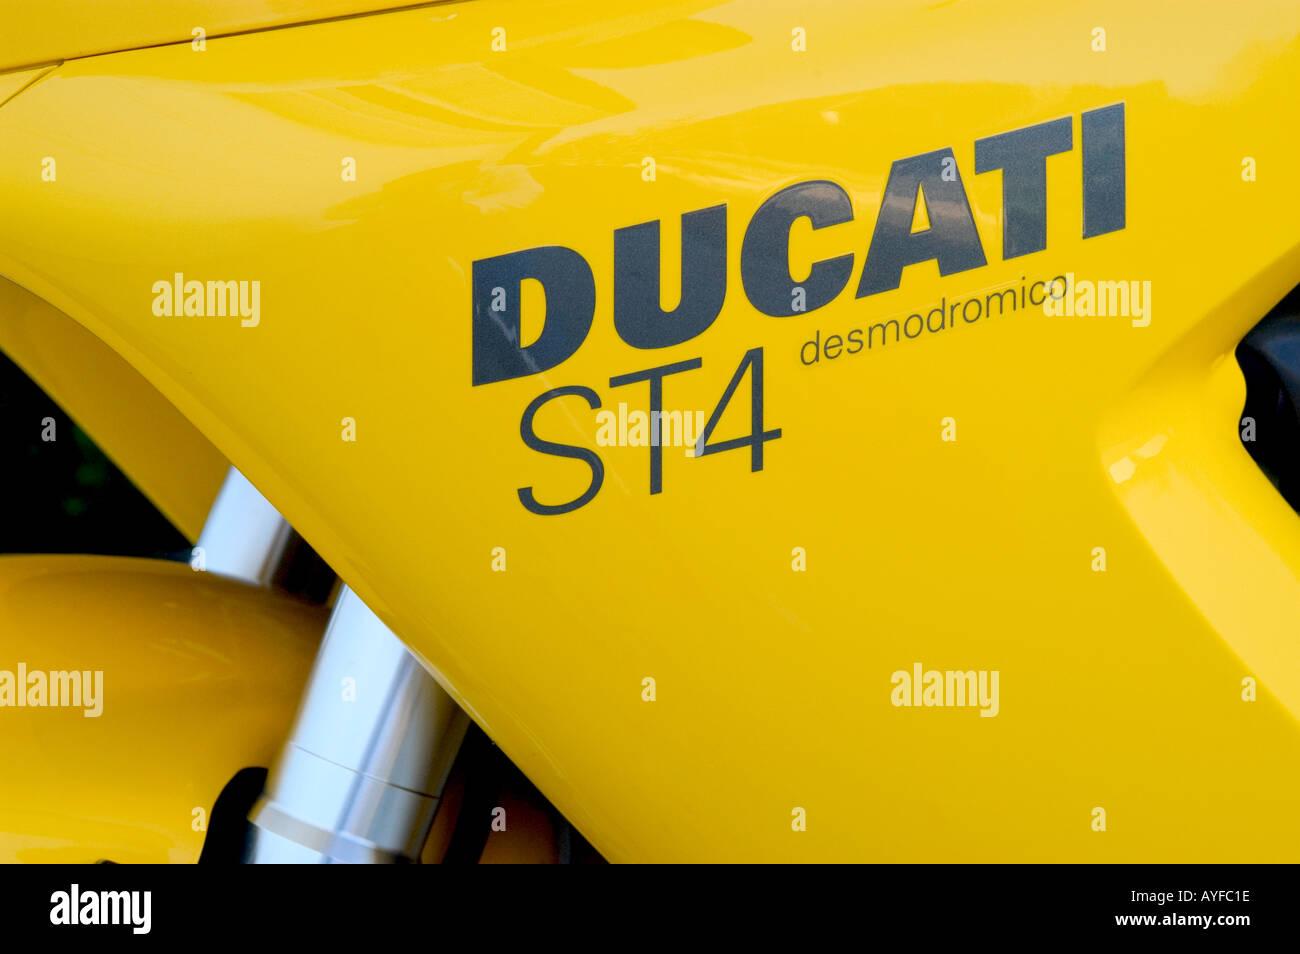 Ducati Motorcycle - Stock Image